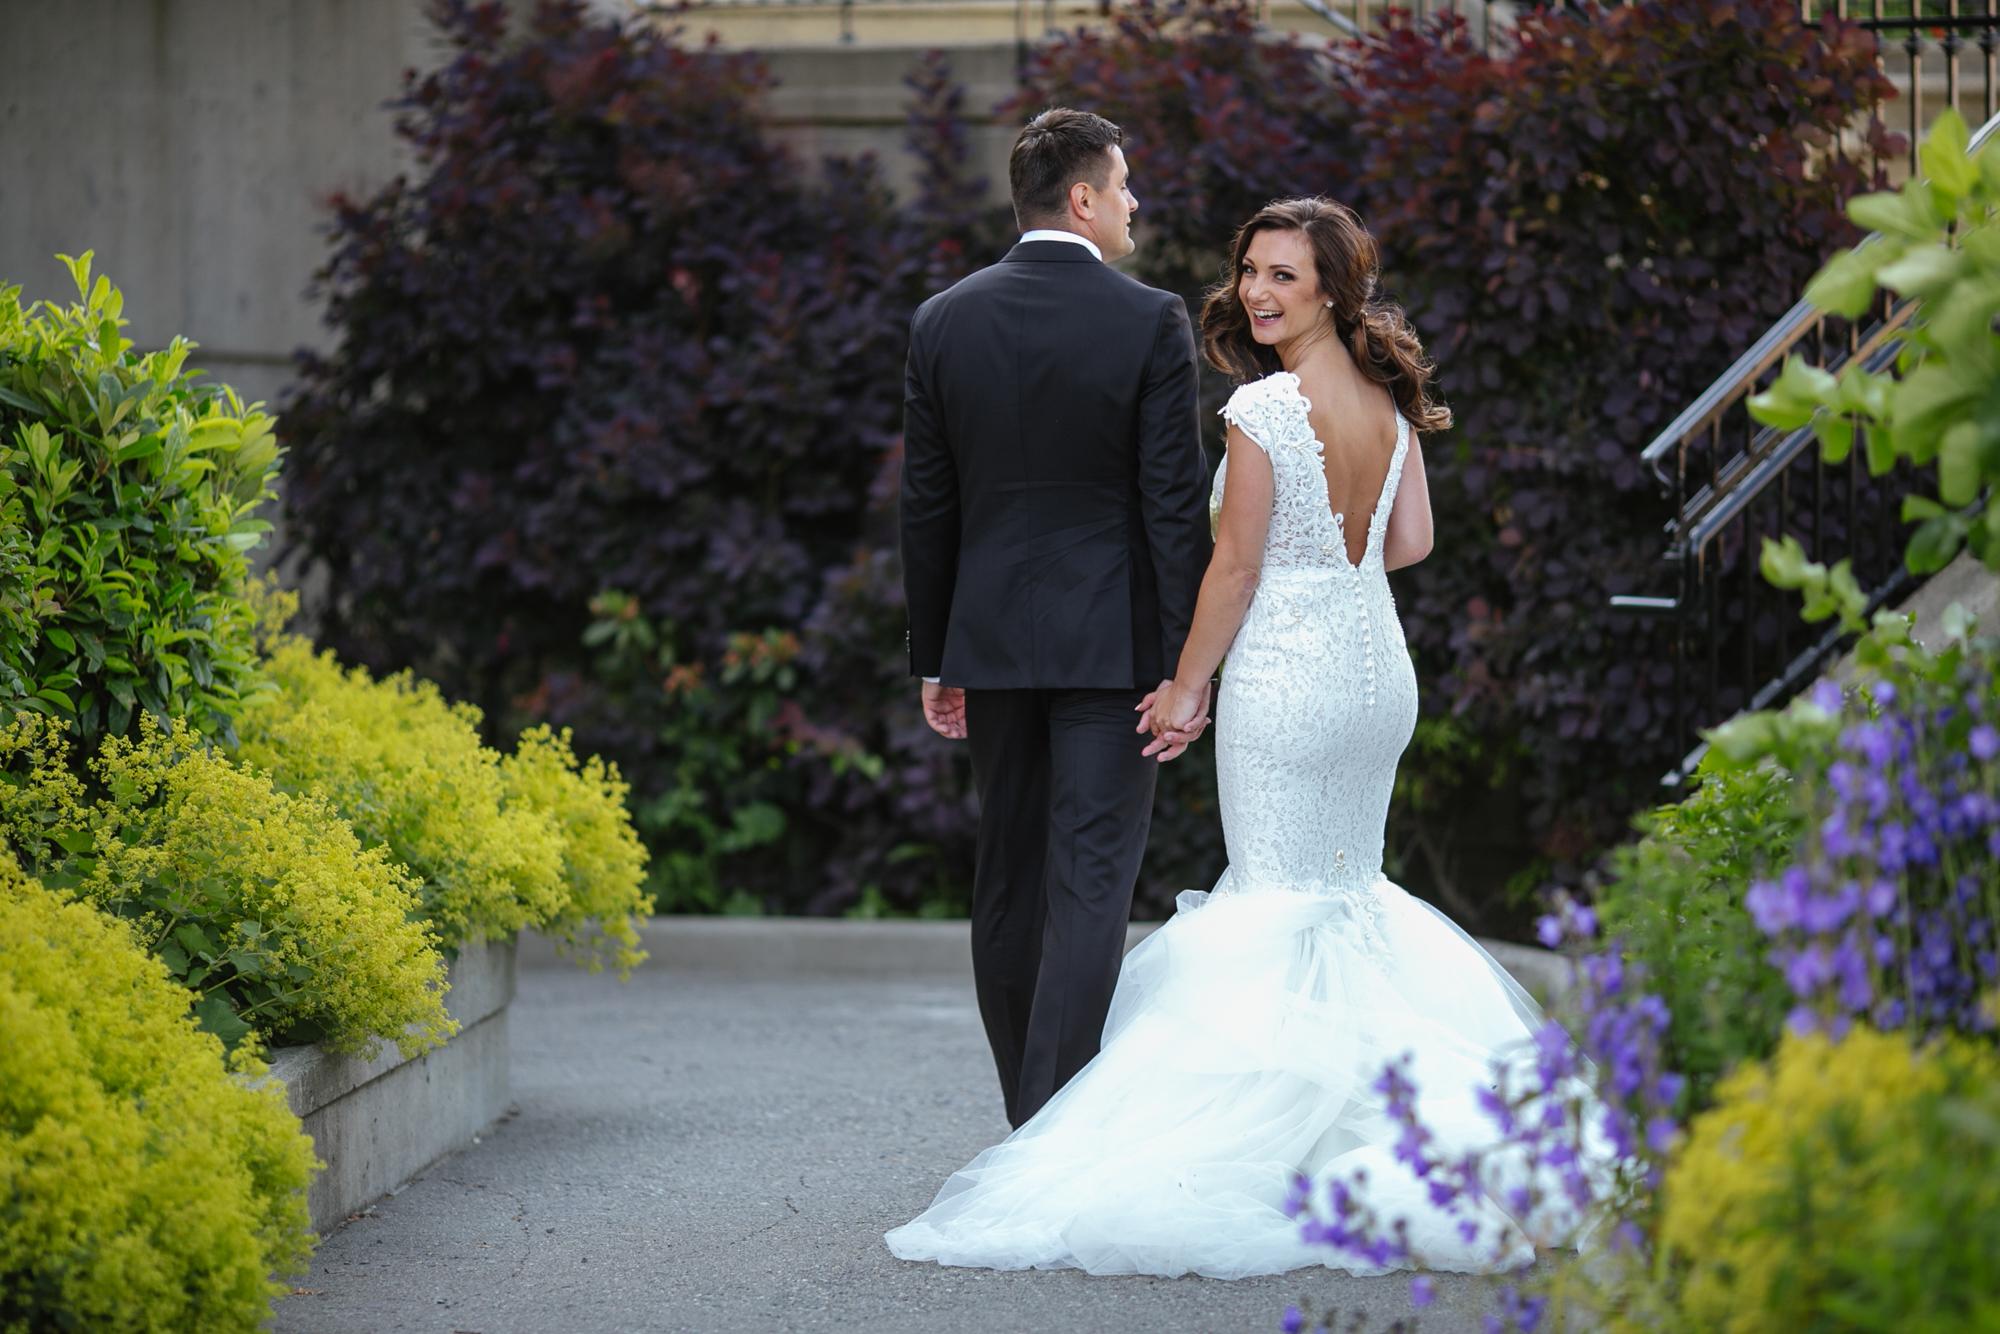 vancouver-luxury-wedding-photographer-lori-miles-178.jpg